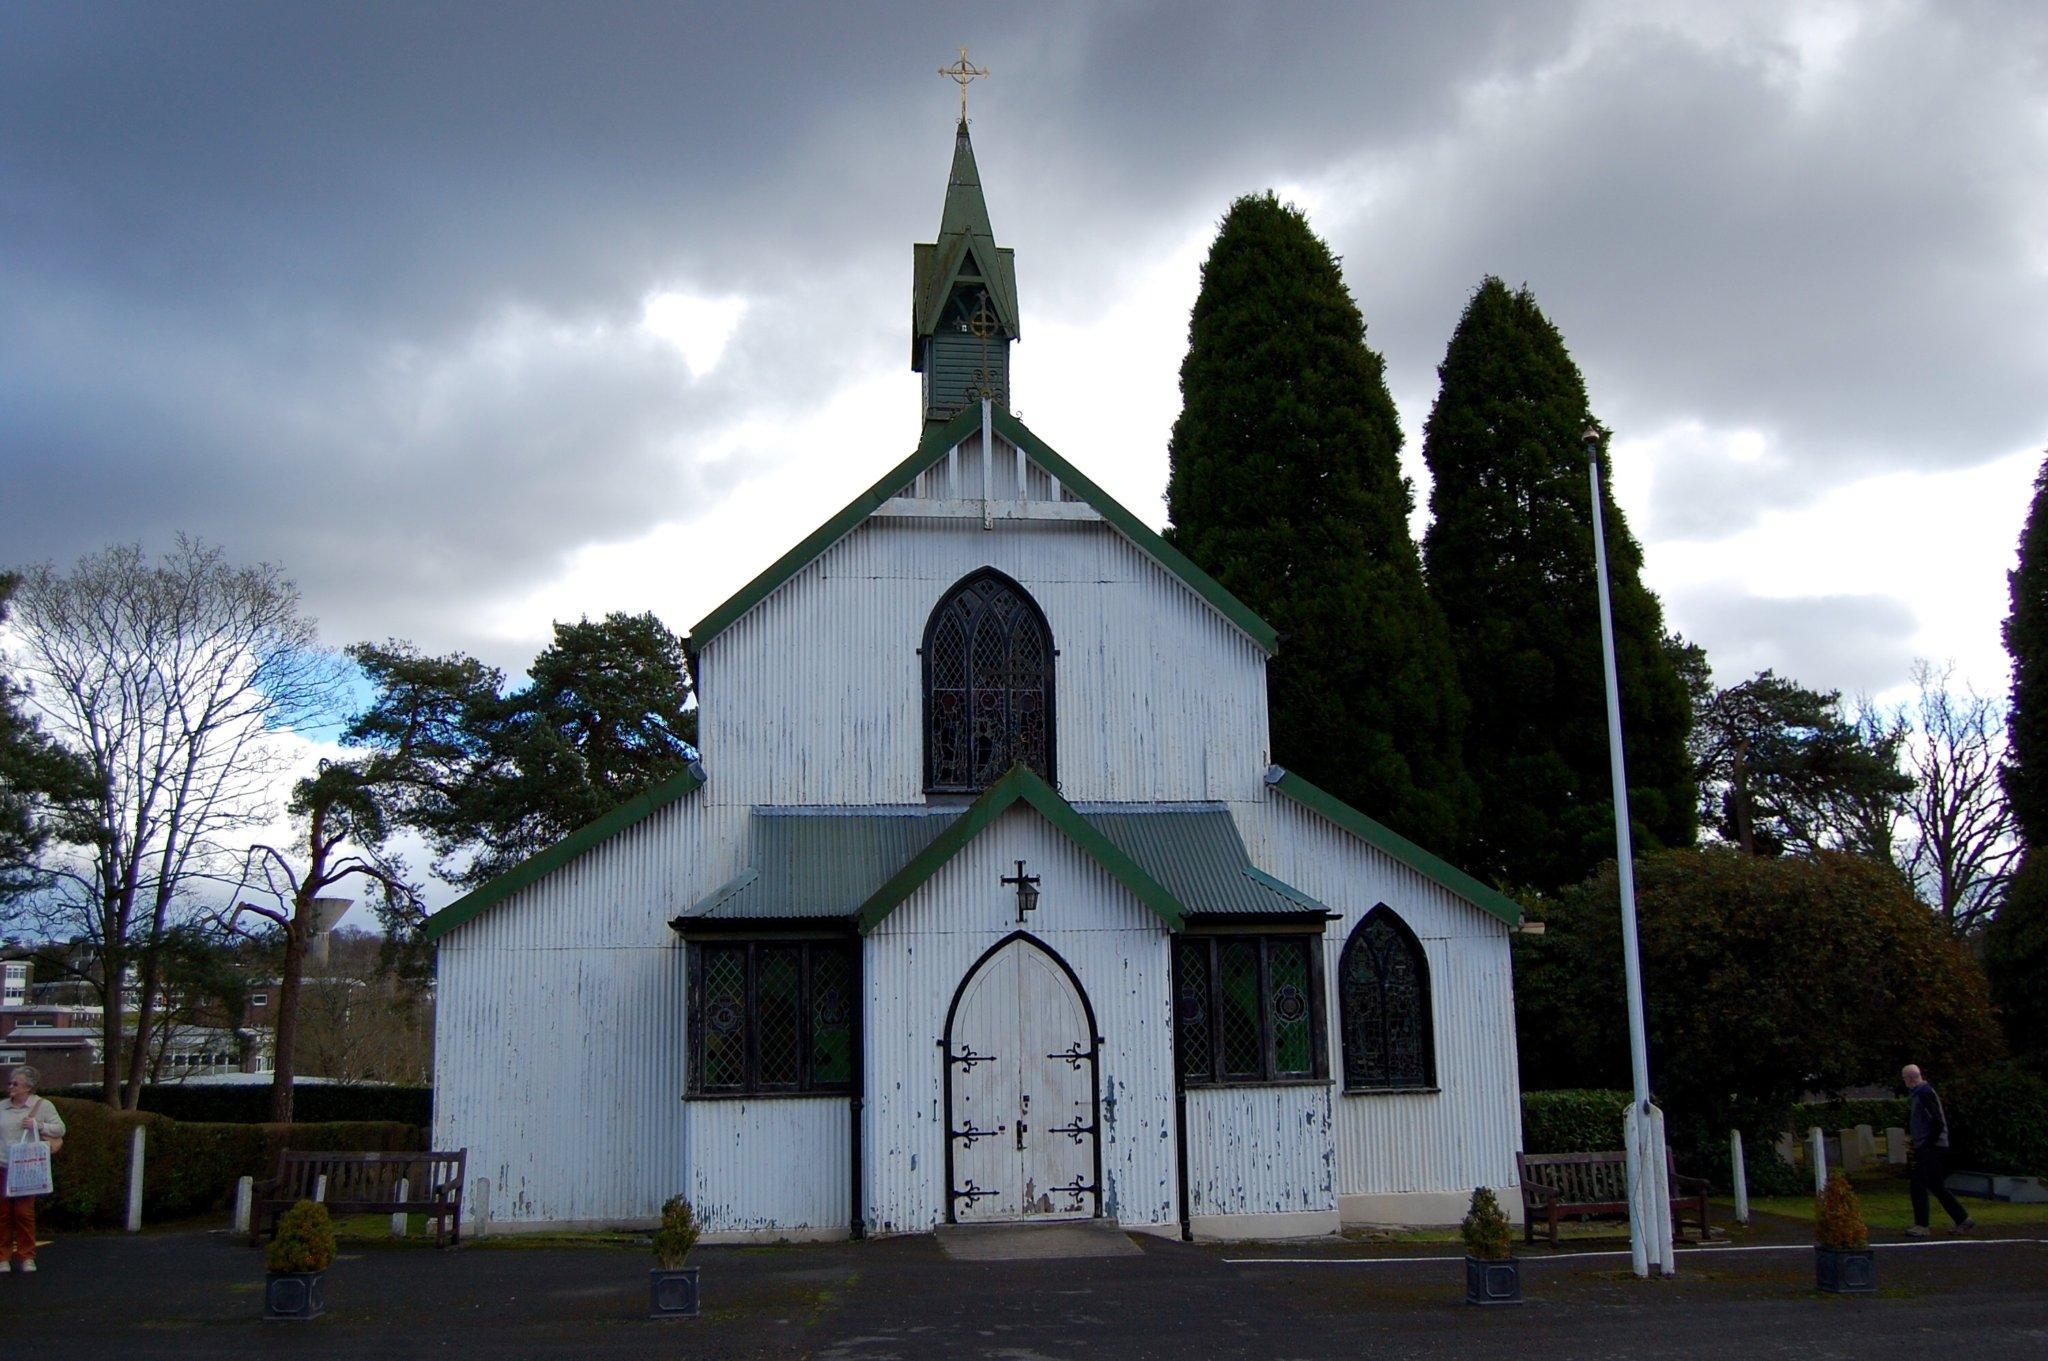 St Barbara's Garrison Church in Deepcut